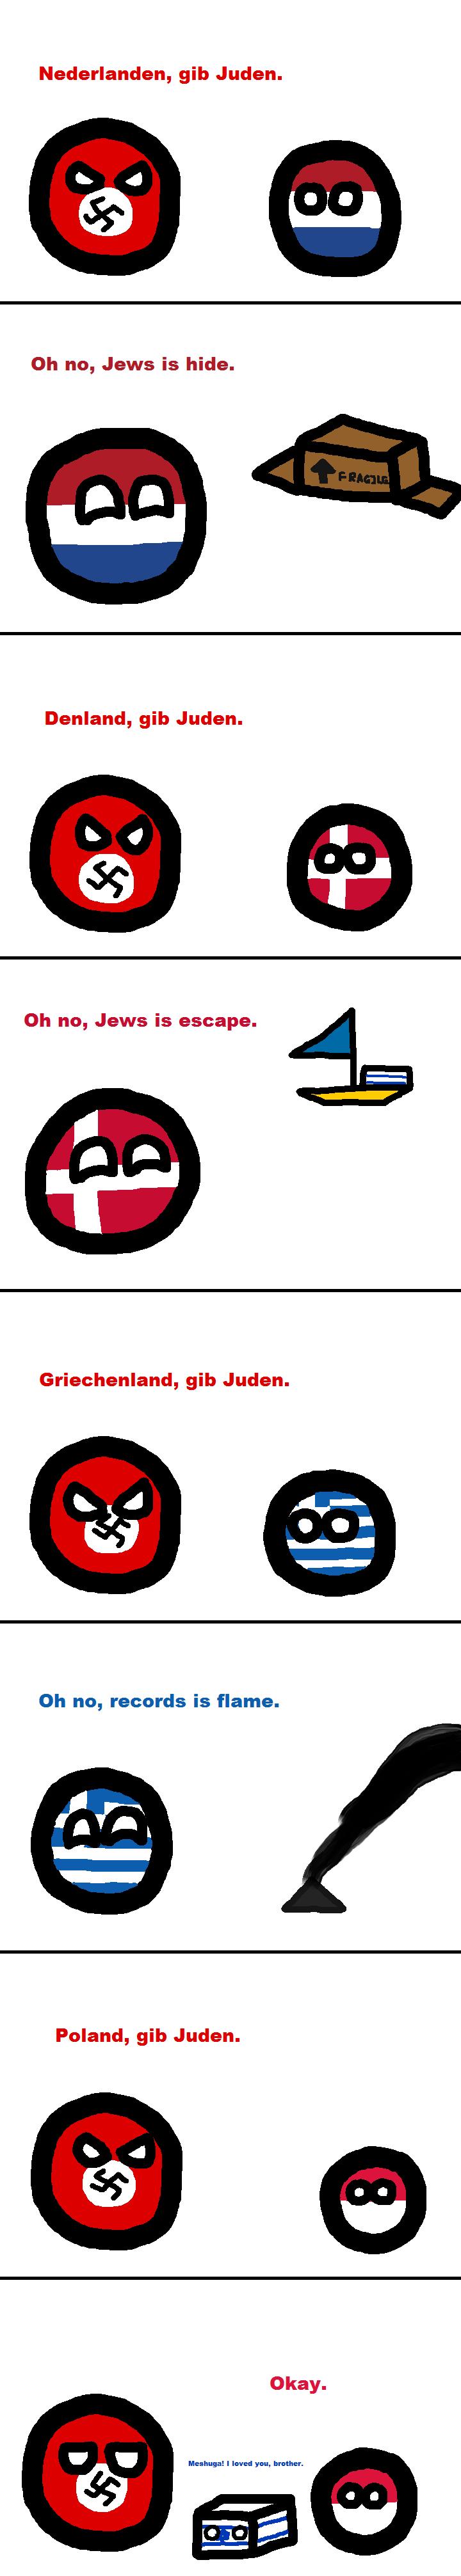 The brave Poland